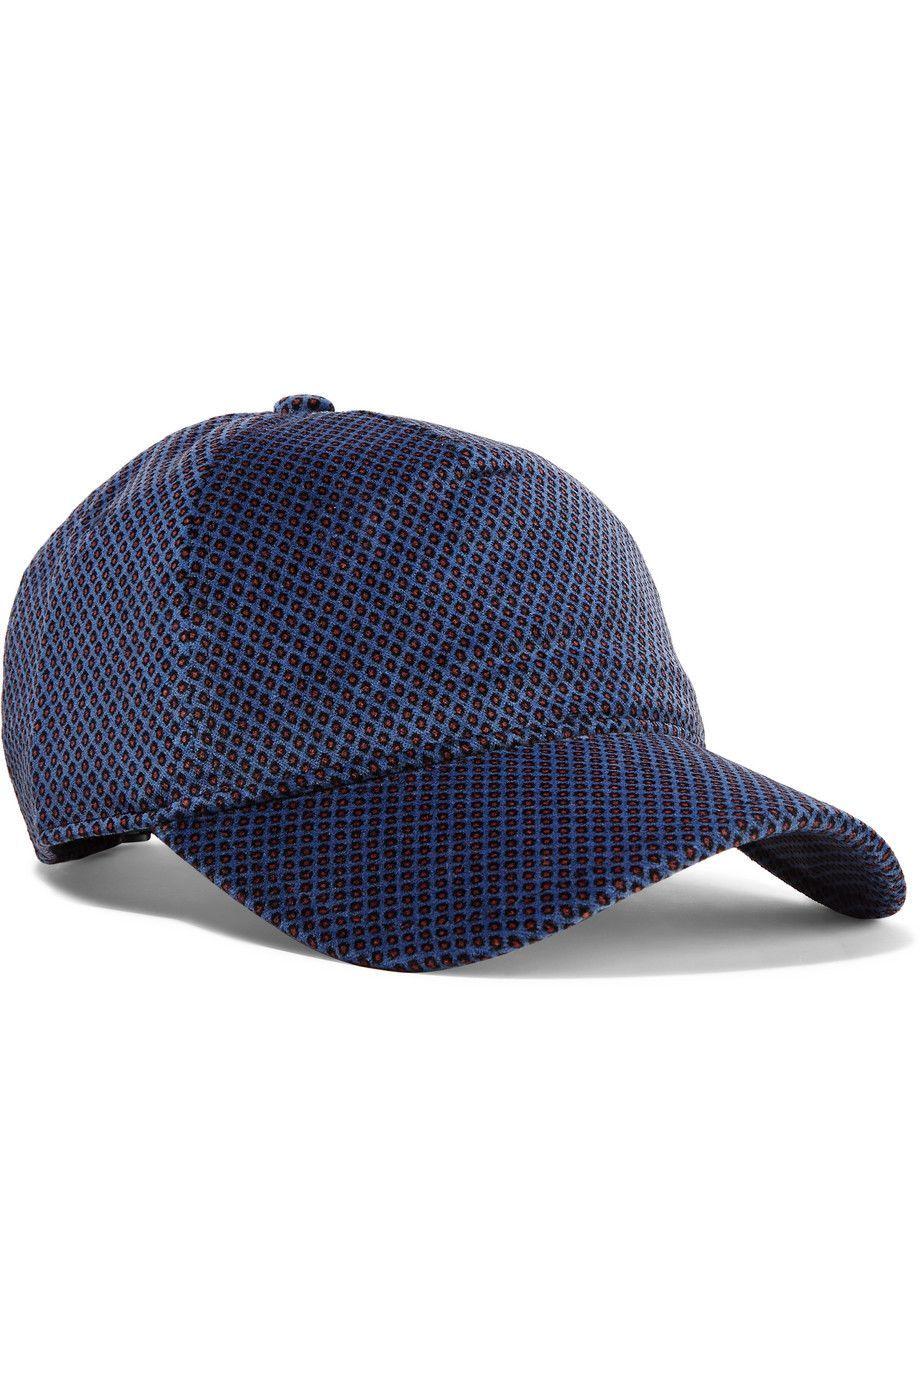 #PopbelaOOTD: Topi Ter-fashion Minggu Ini